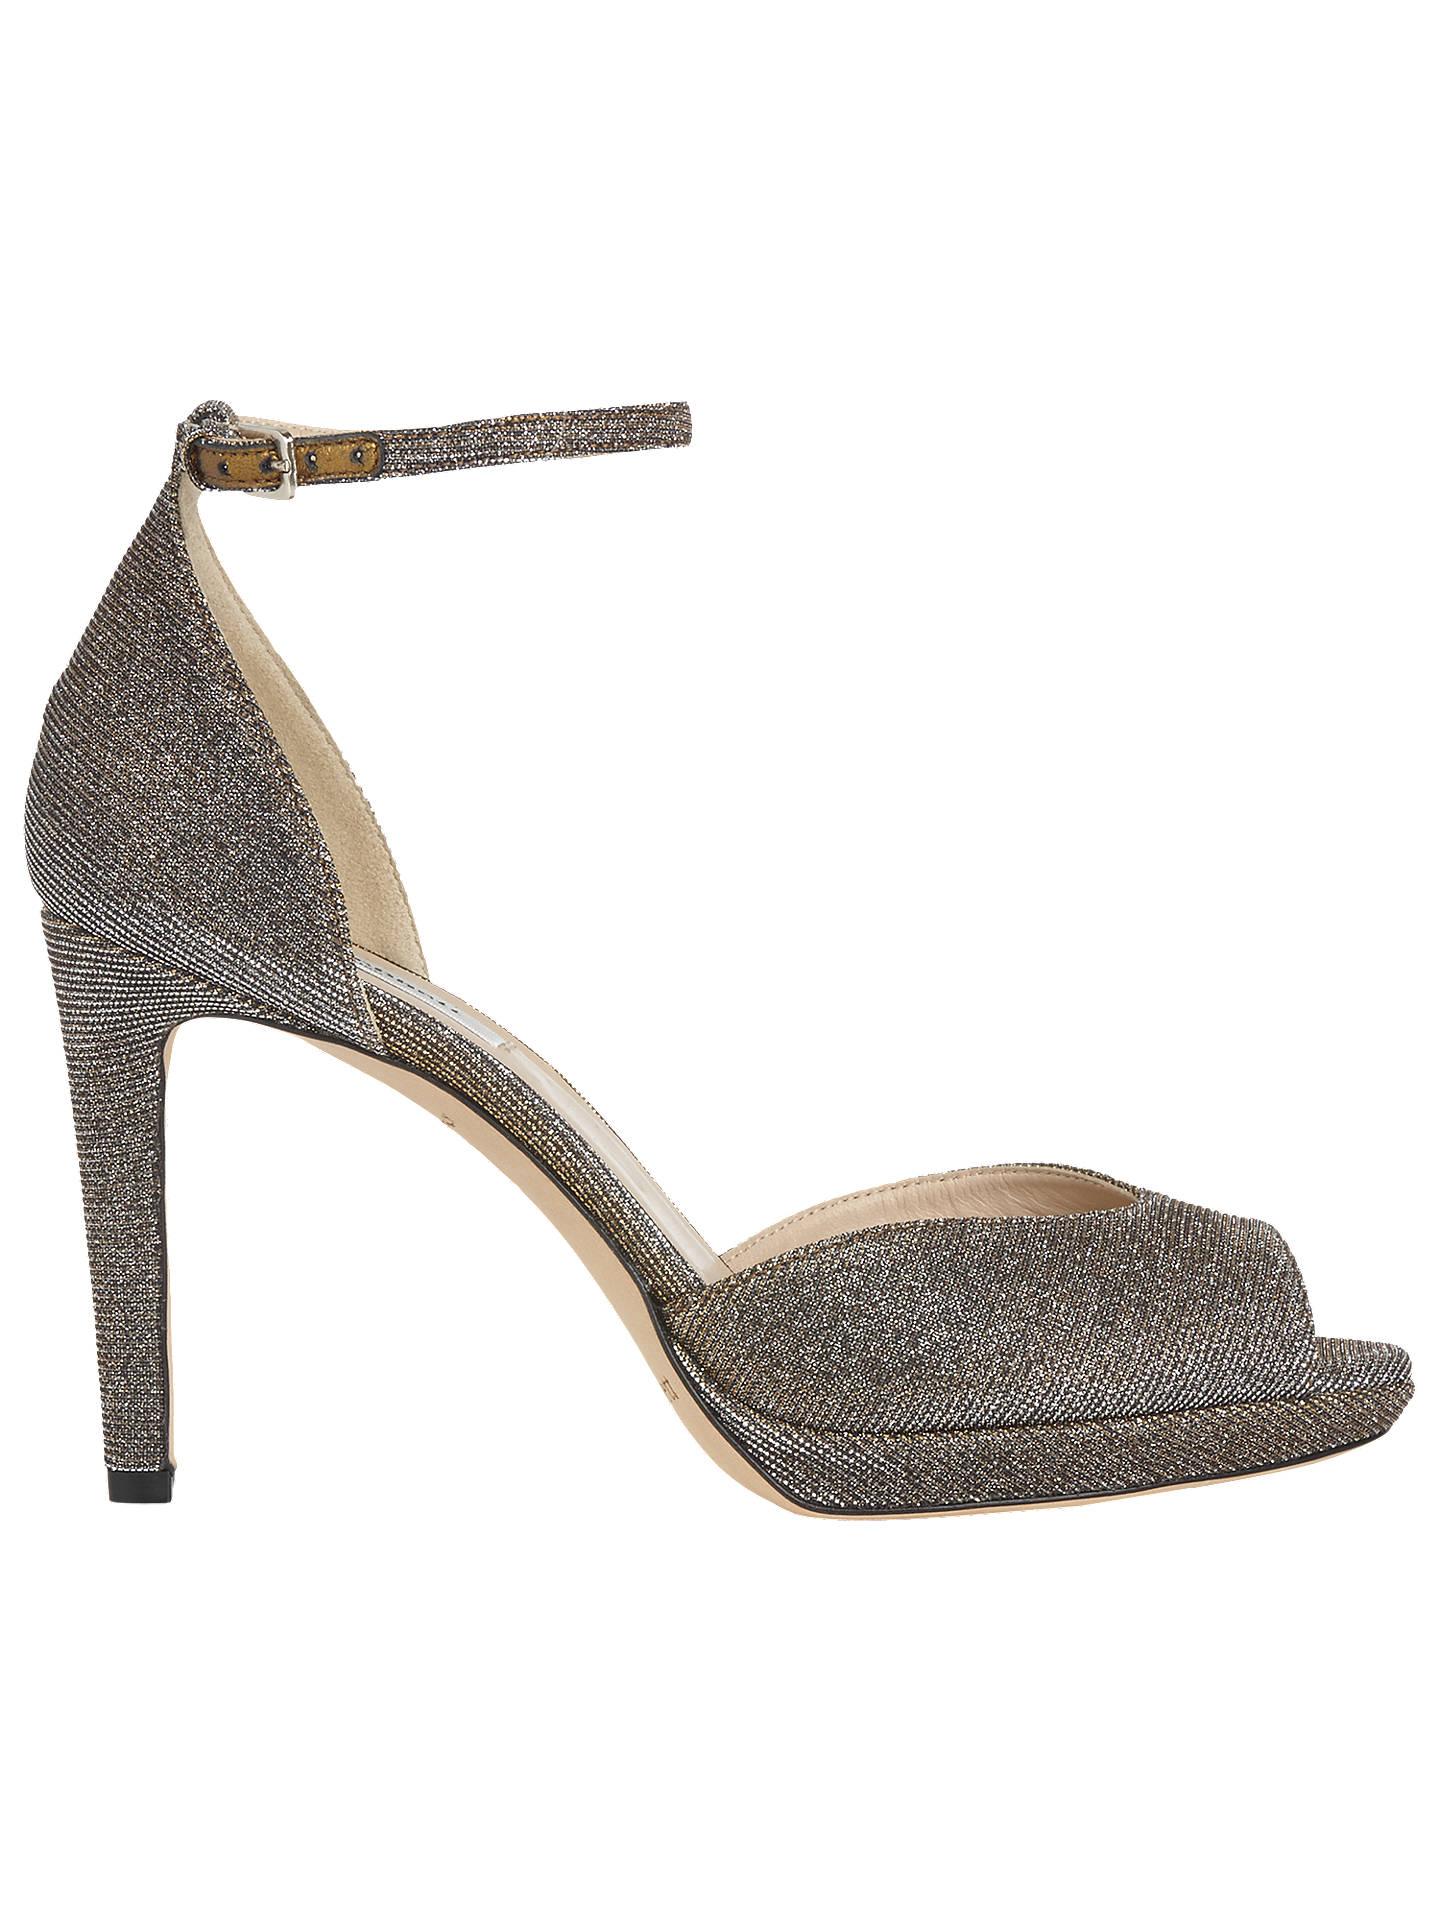 7169d73d076f ... Buy L.K. Bennett Yasmin Stiletto Heeled Sandals